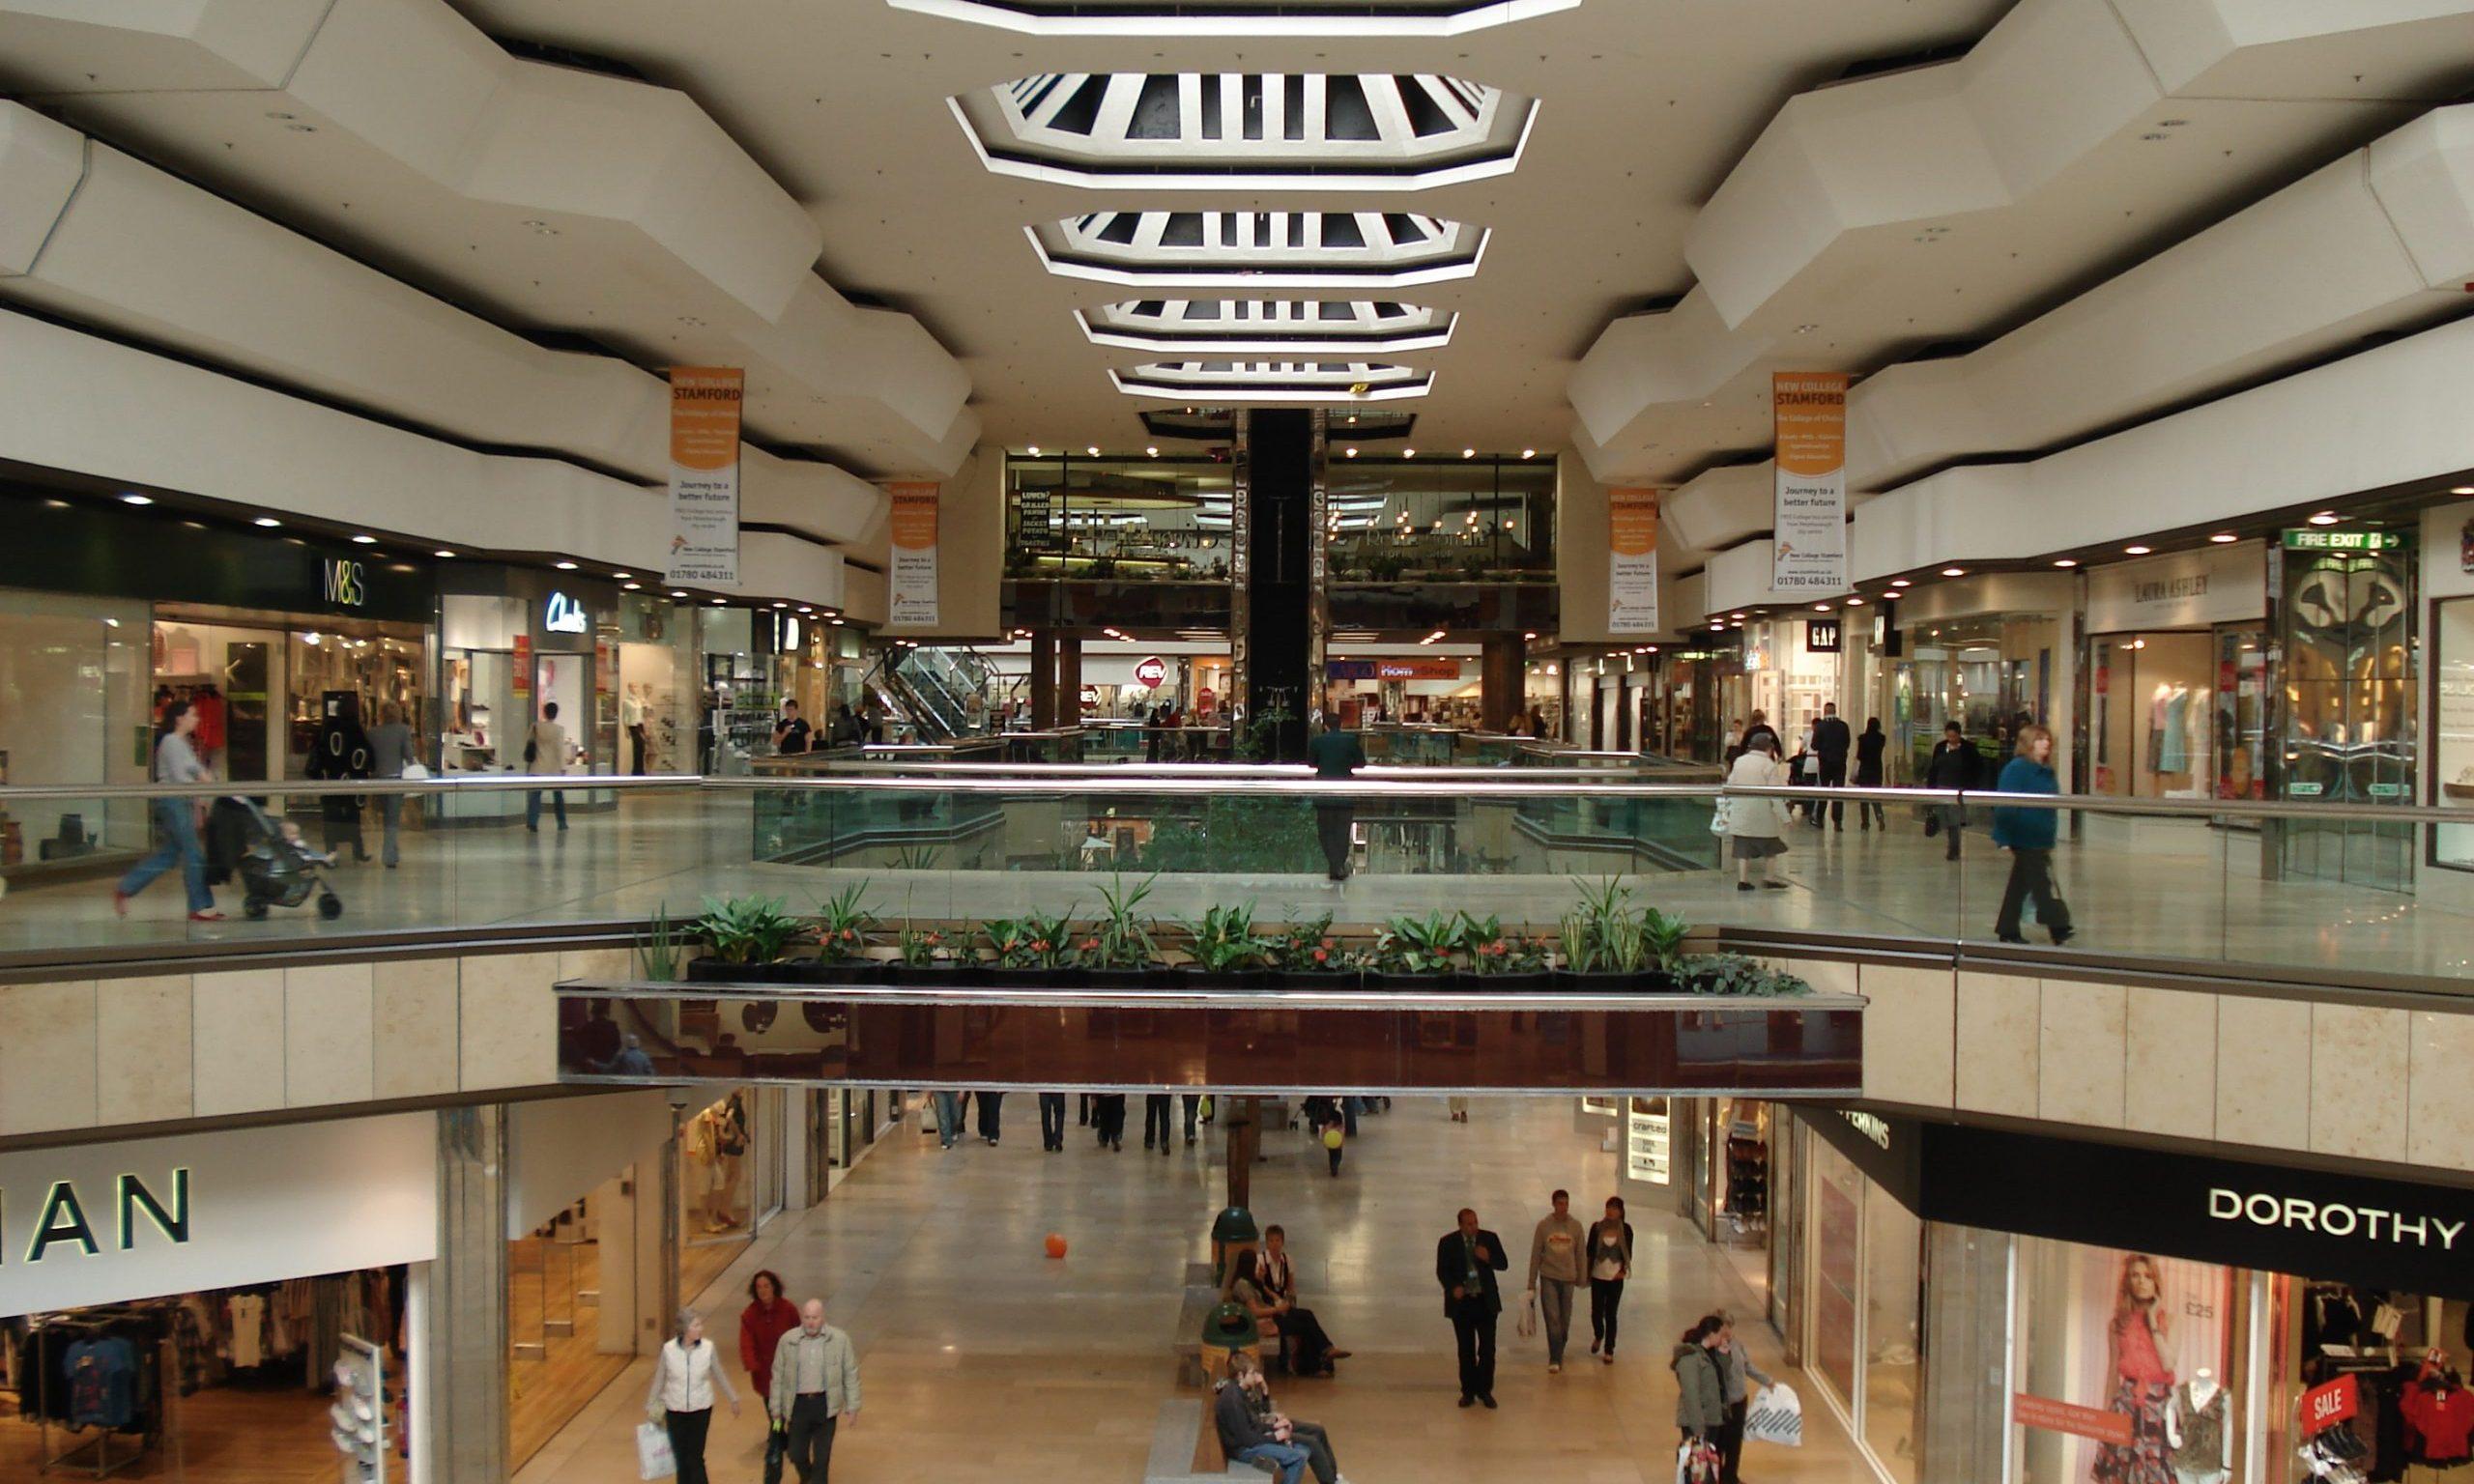 Queensgate Shopping